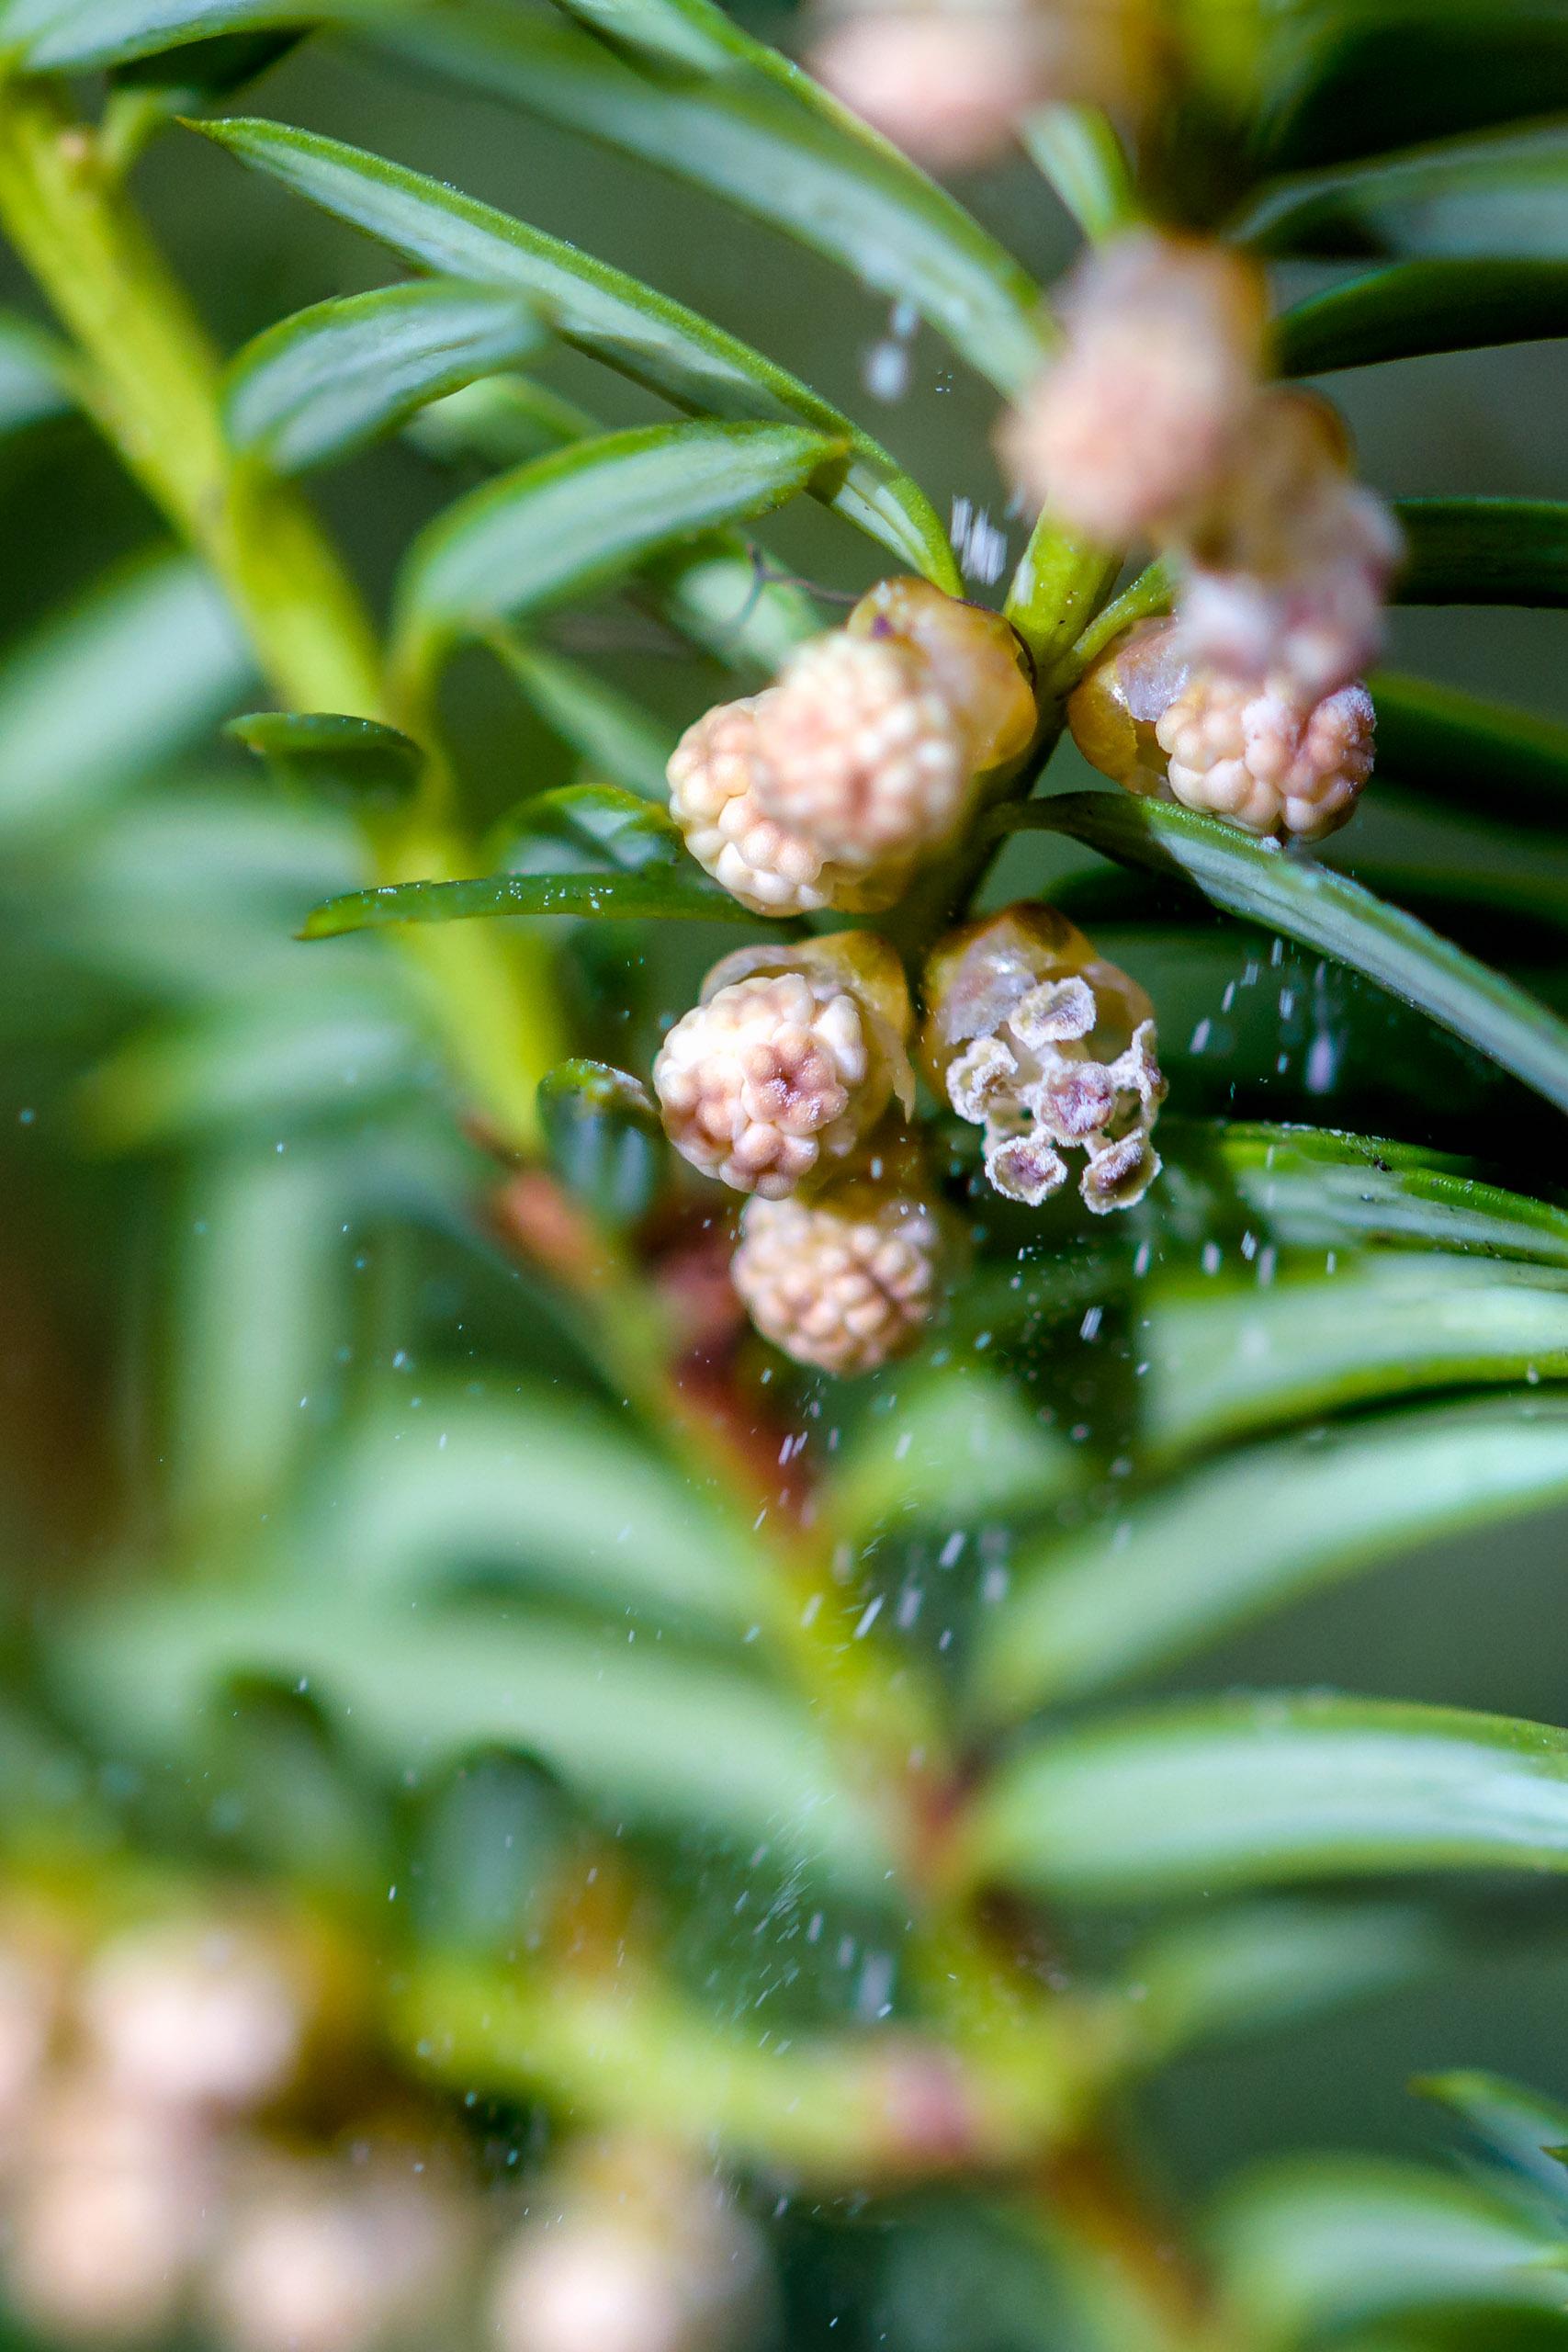 Western yew releasing its pollen